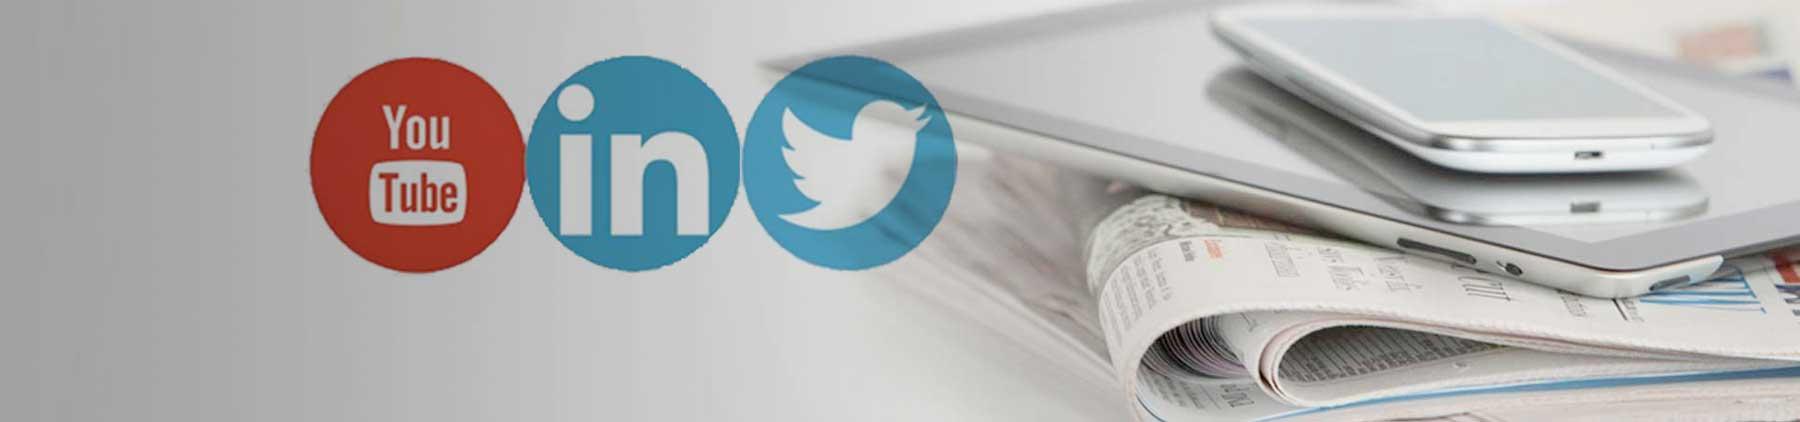 LUMENDI EXPANDS SOCIAL MEDIA PRESENCE